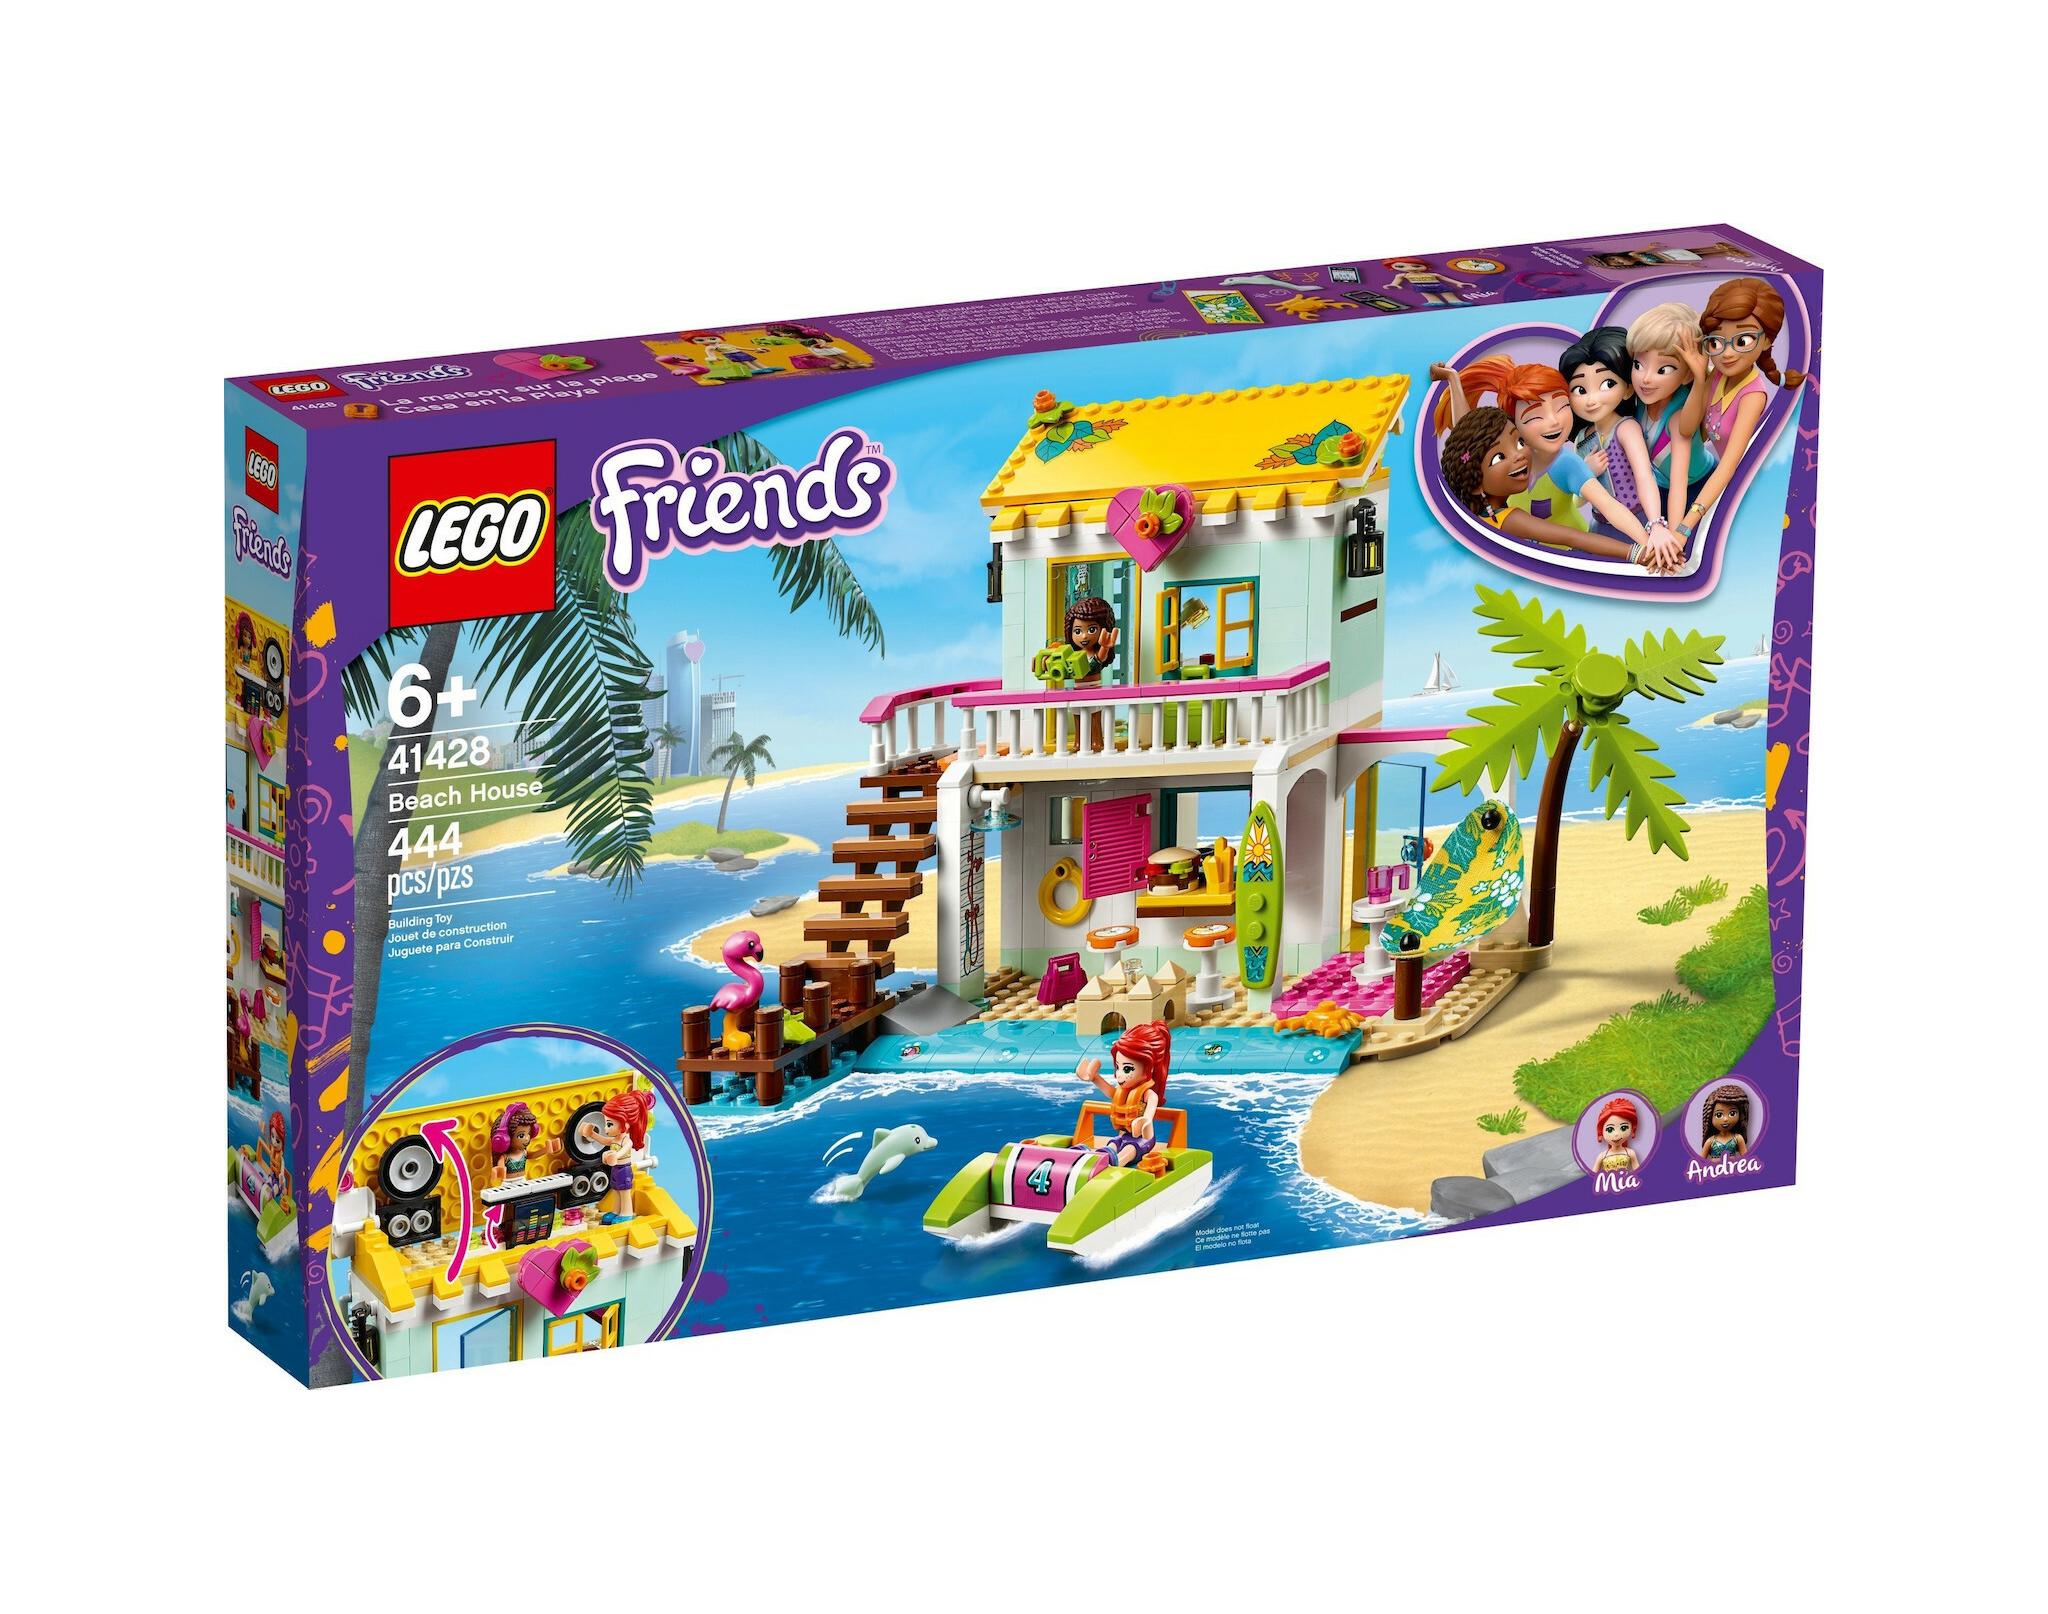 Lego Friends: Beach House 41428